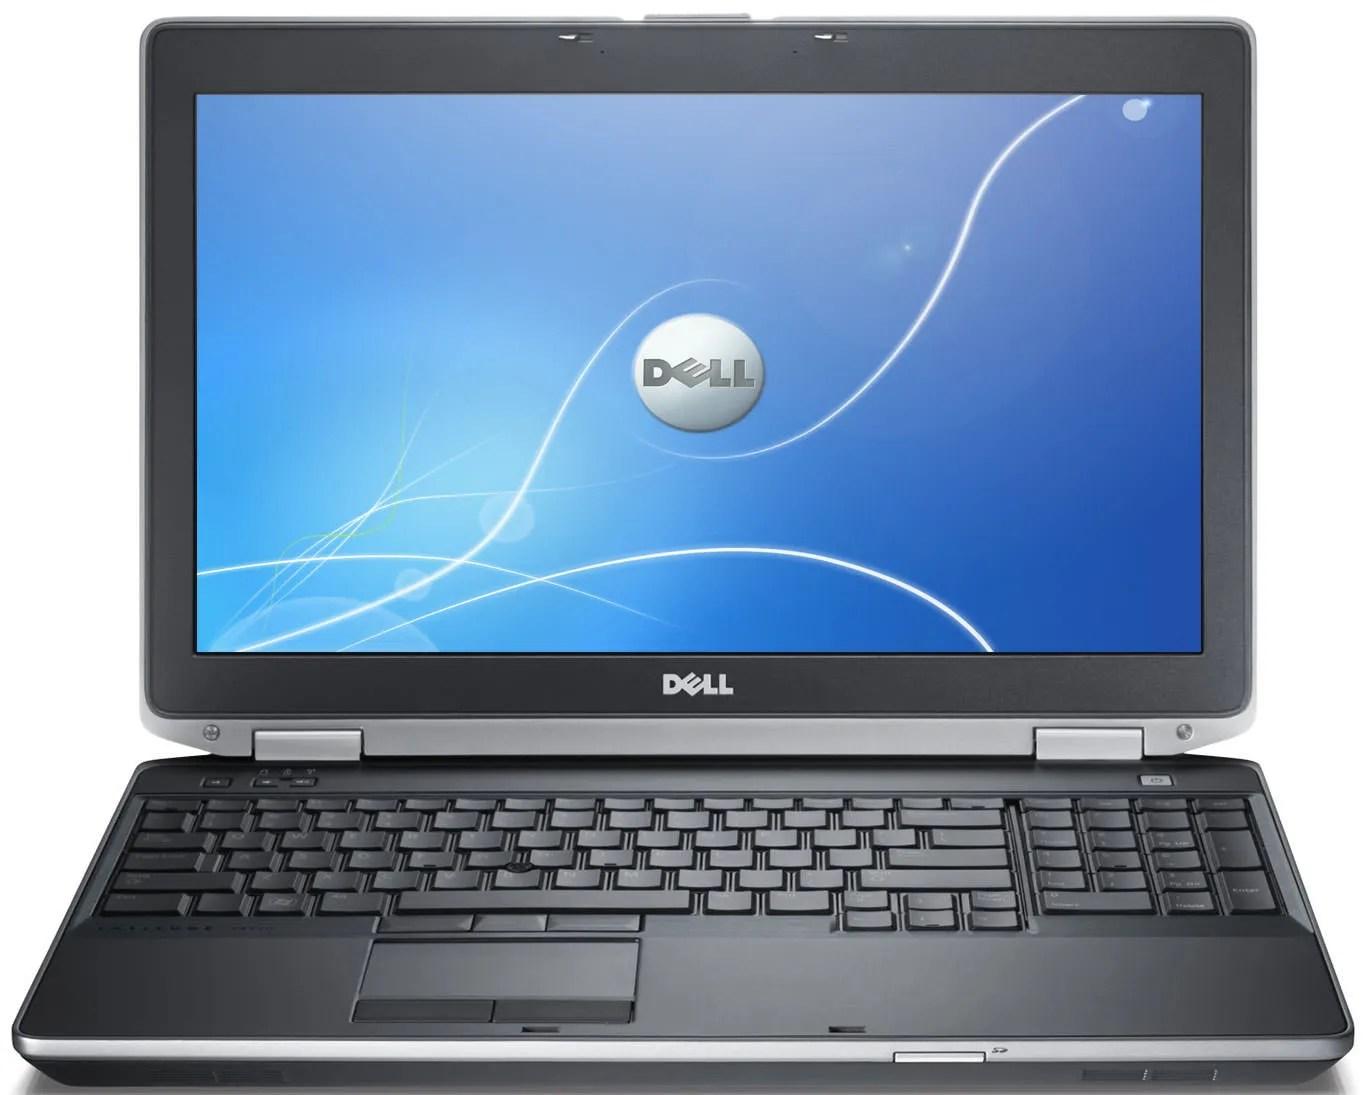 hight resolution of dell latitude e6530 laptop core i5 2nd gen 4 gb 500 gb